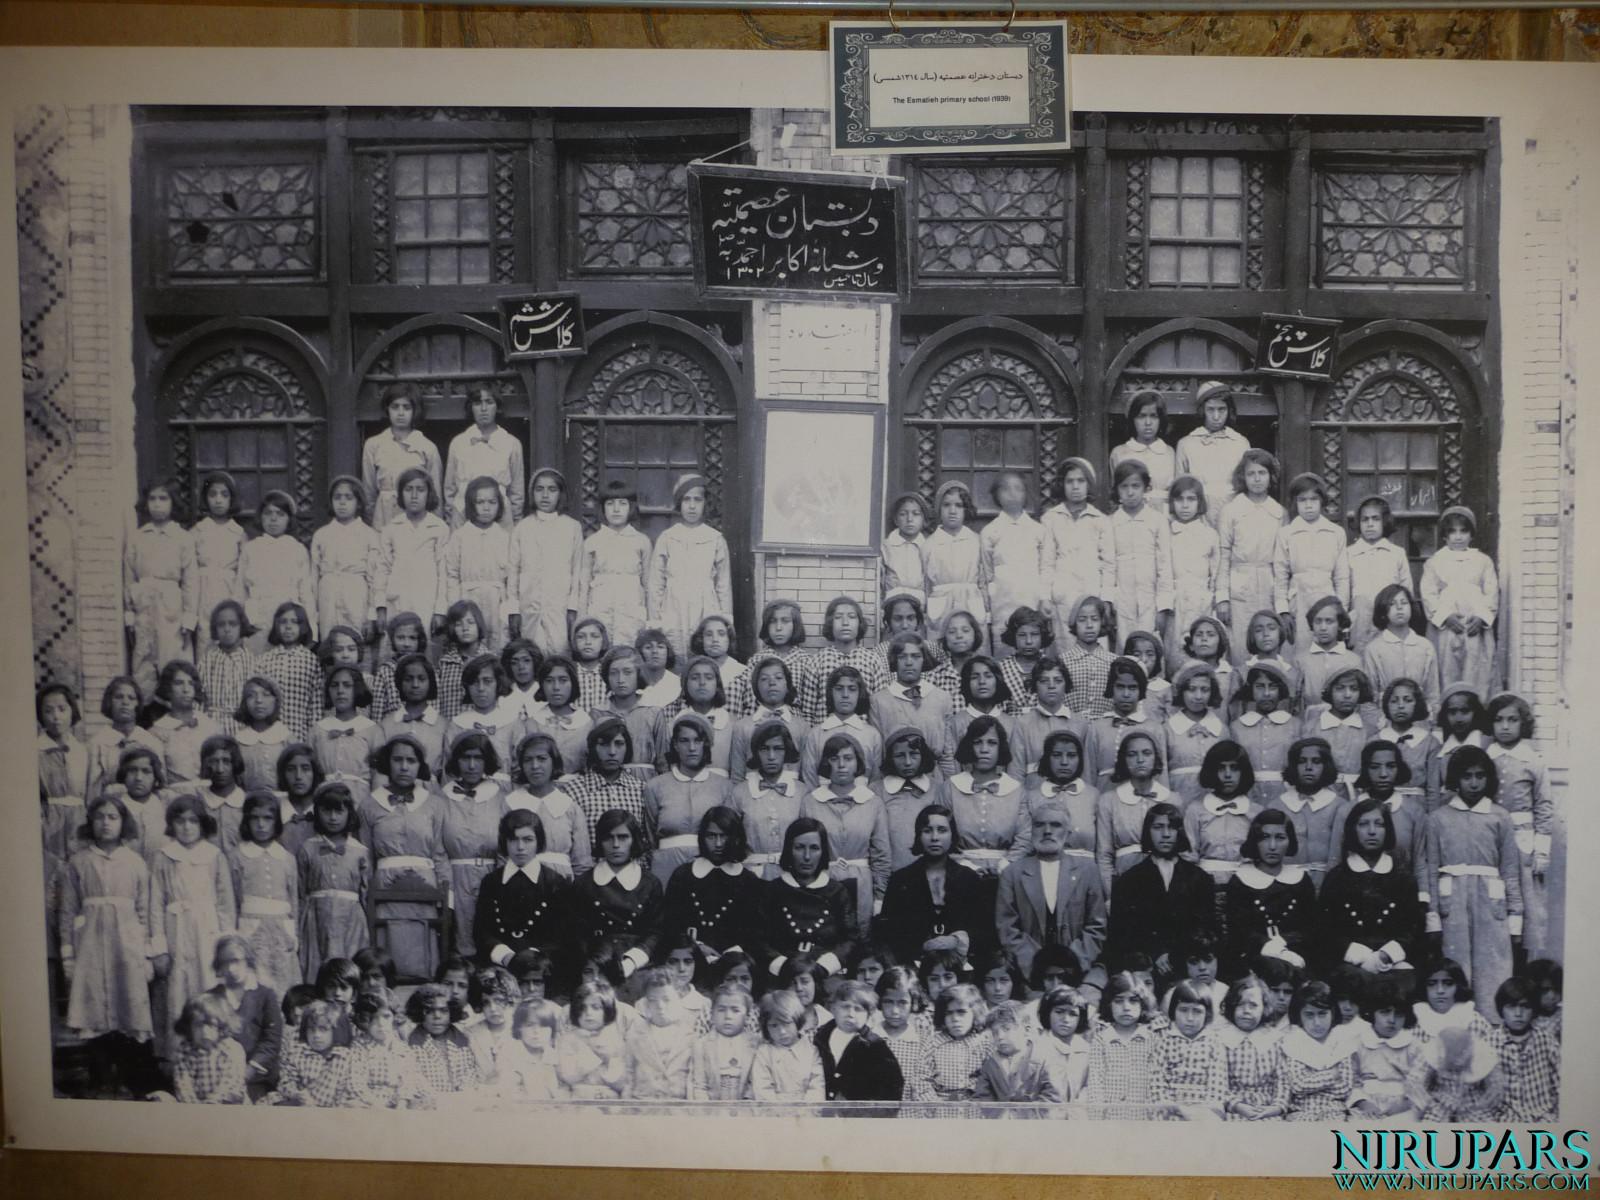 Arg-e Karim Khan - Esmatieh Elementary School